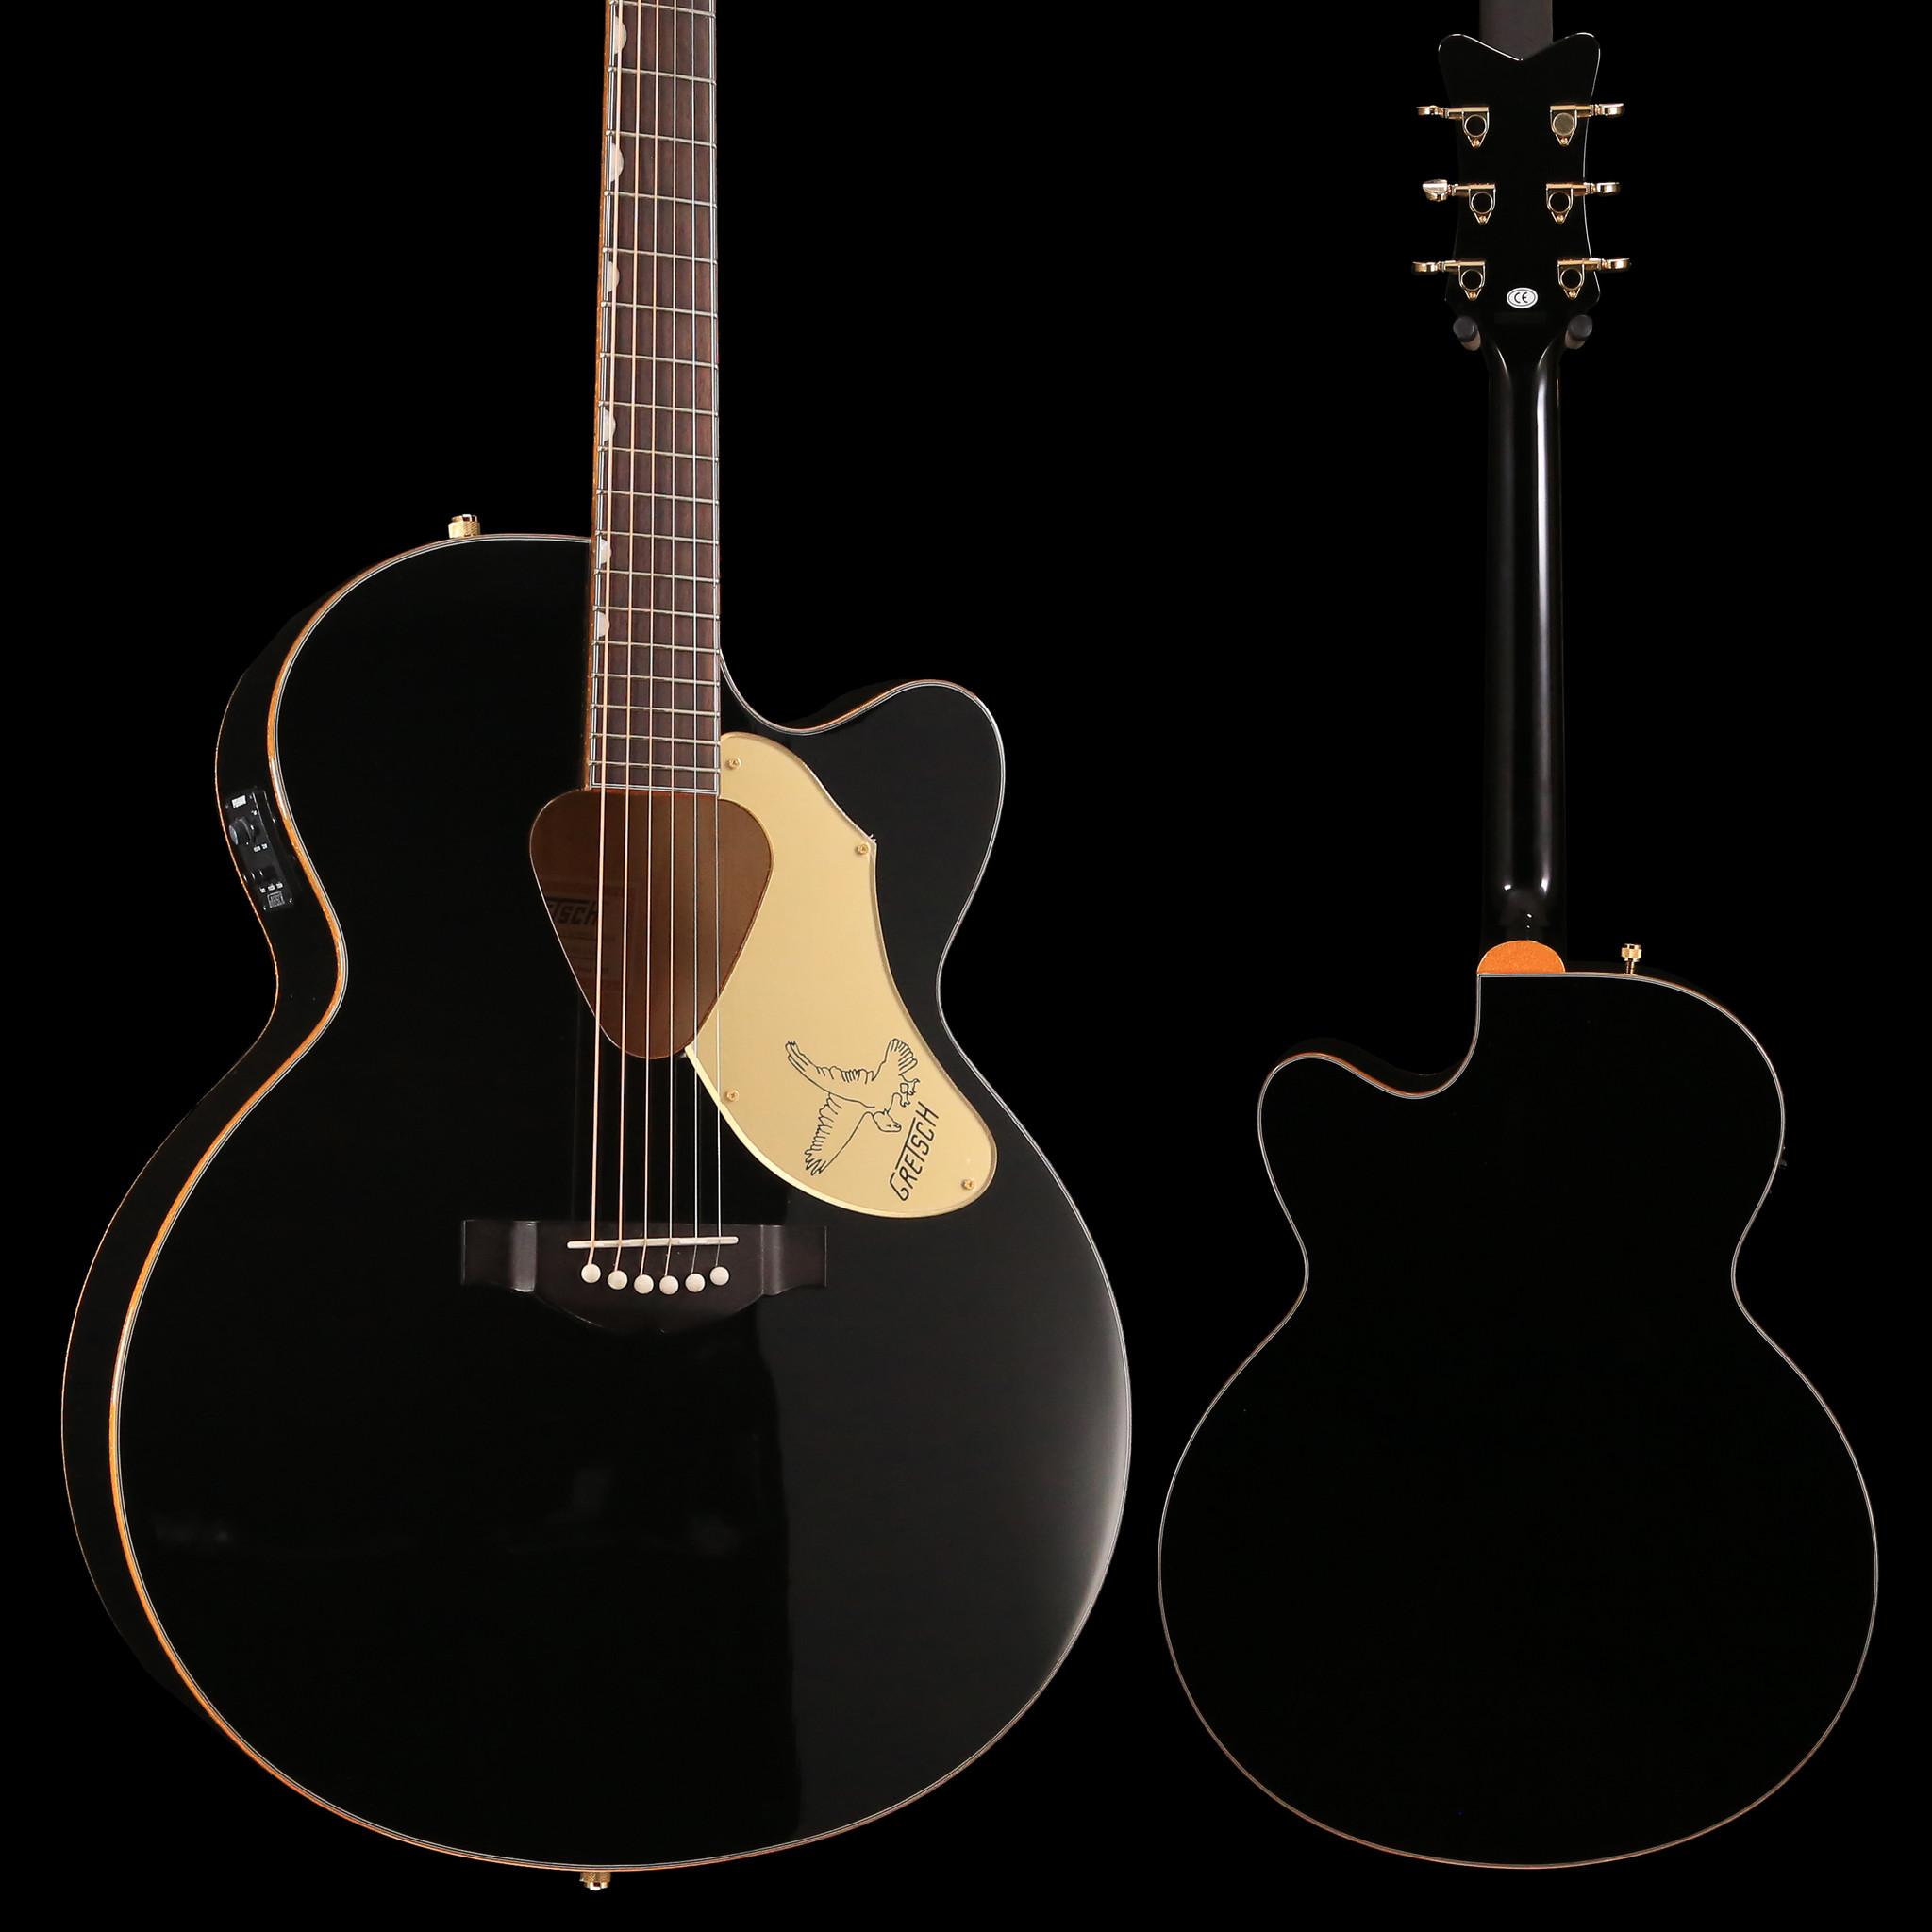 Gretsch Acoustic Guitars >> Gretsch G5022cbfe Rancher Falcon Jumbo Cutaway Acoustic Electric Black